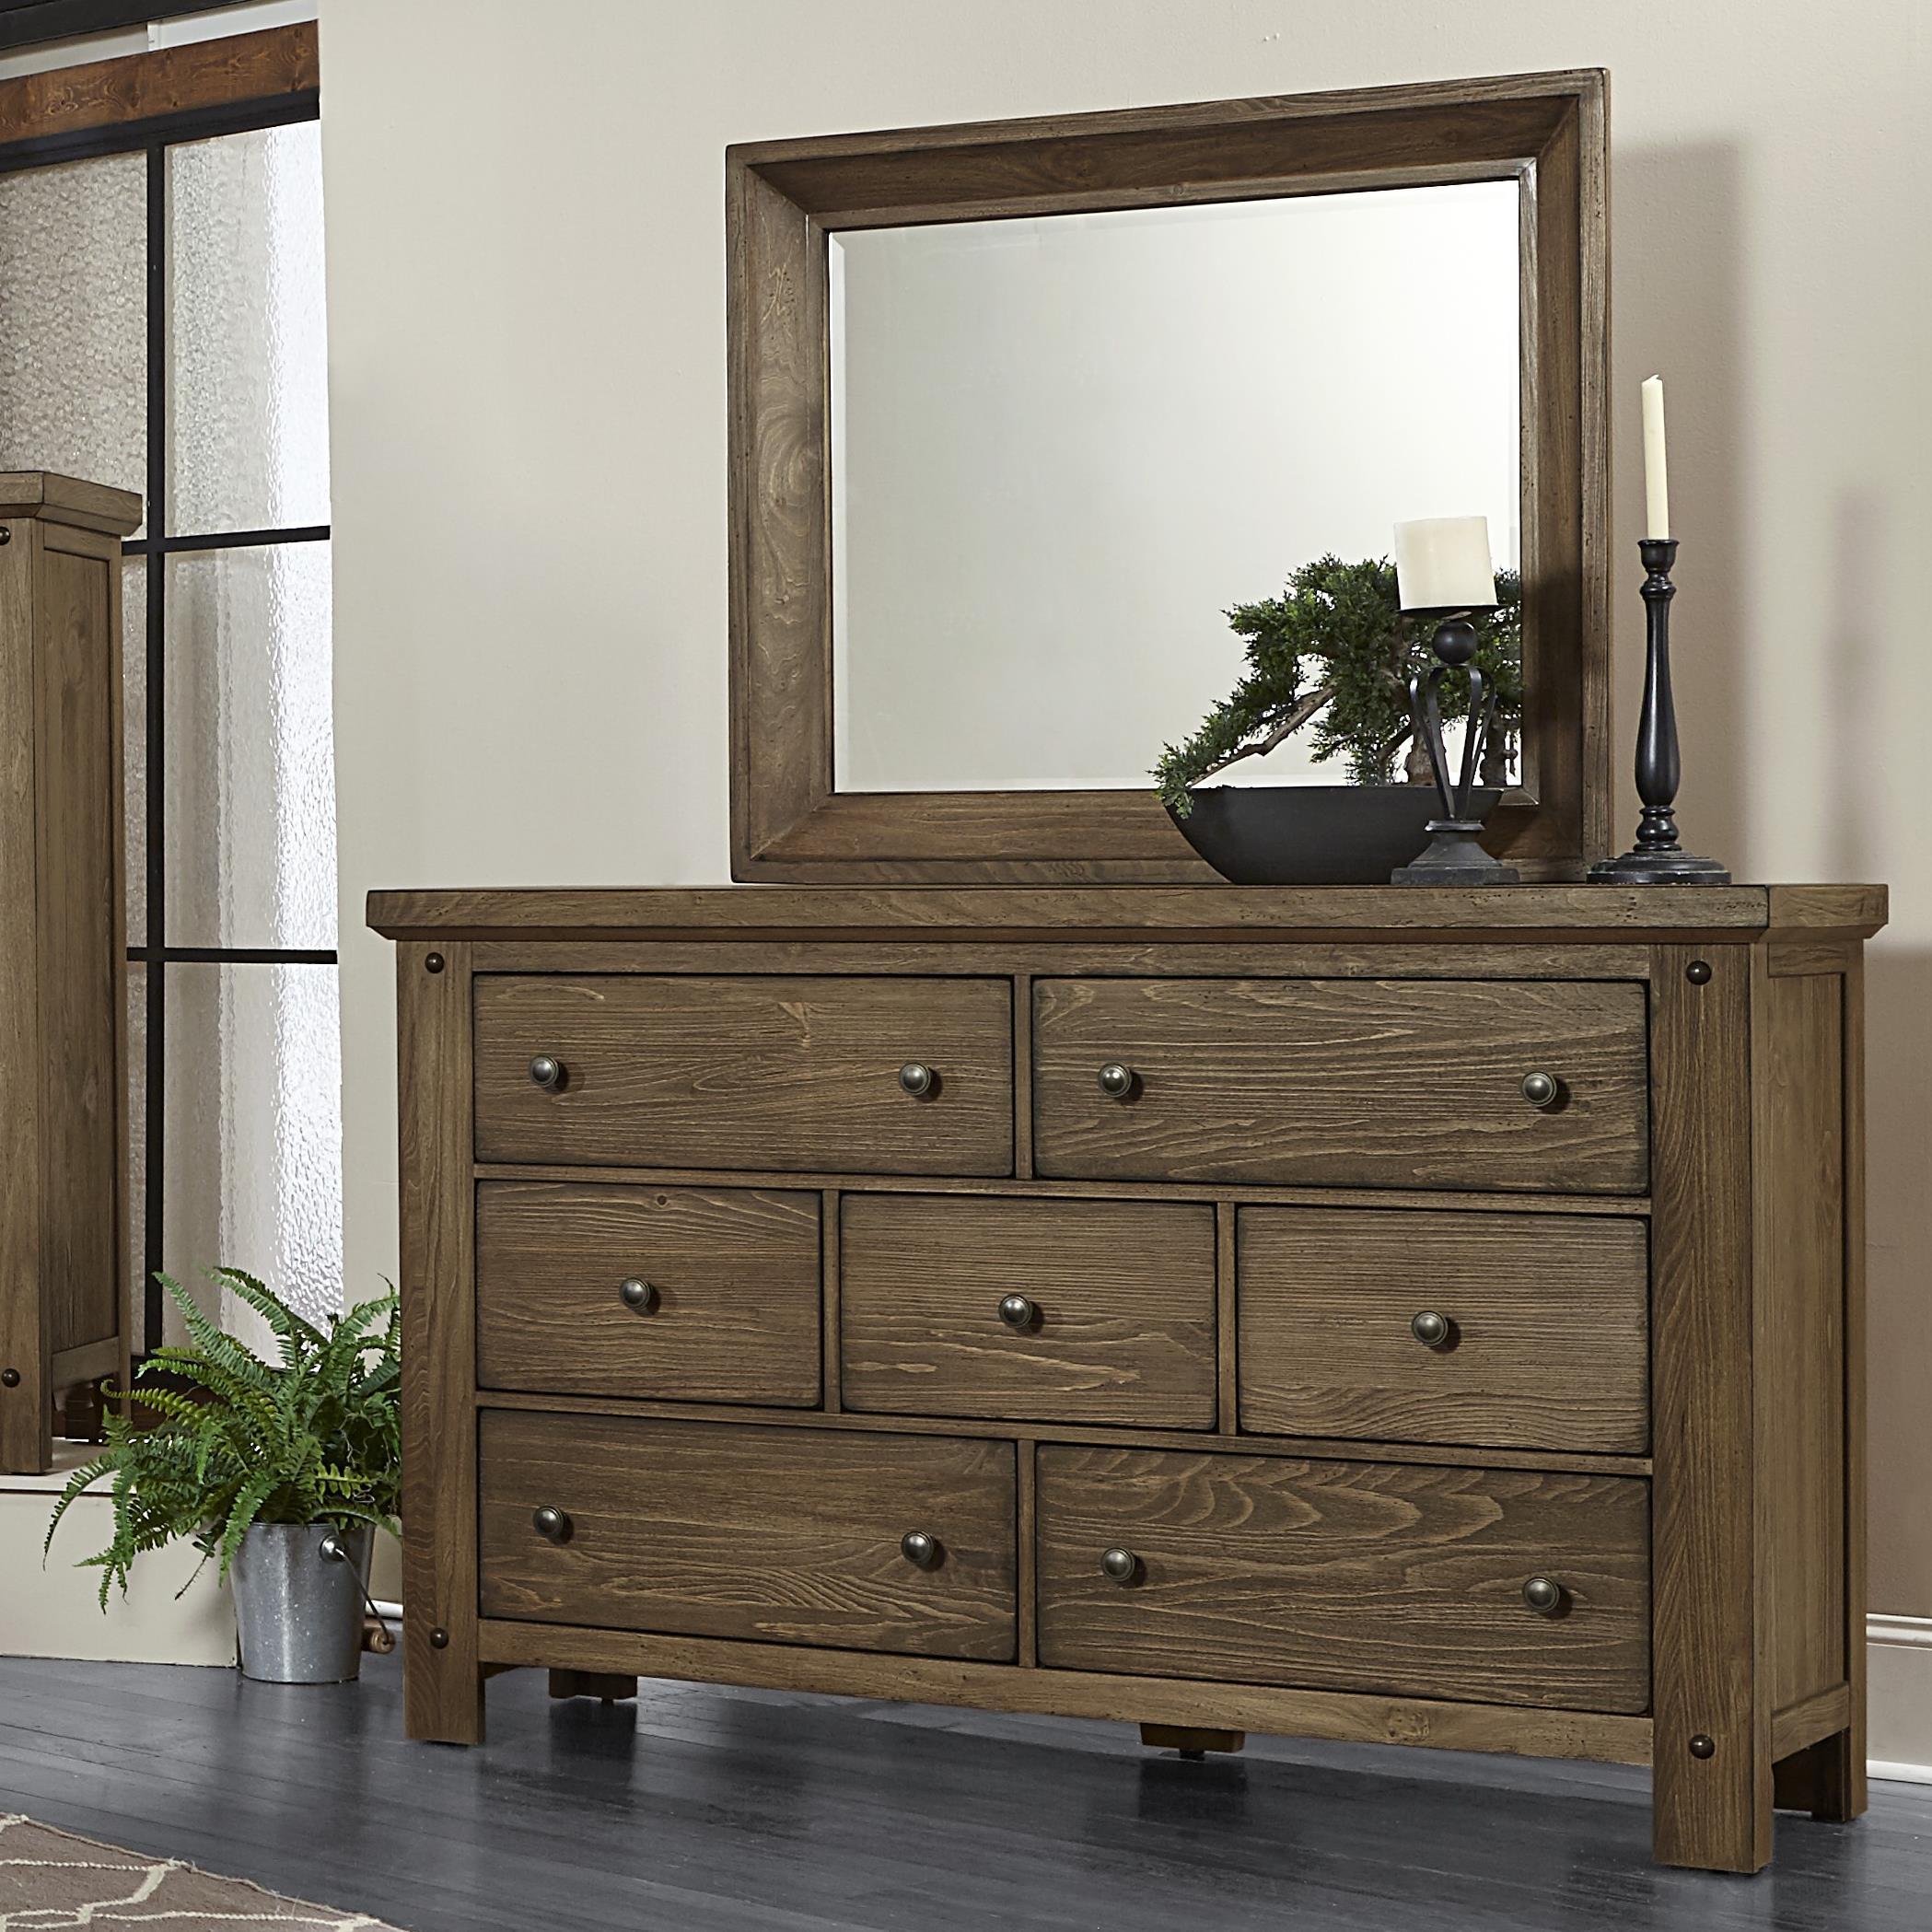 Vaughan Bassett Collaboration Dresser & Mirror - Item Number: 610-002+446